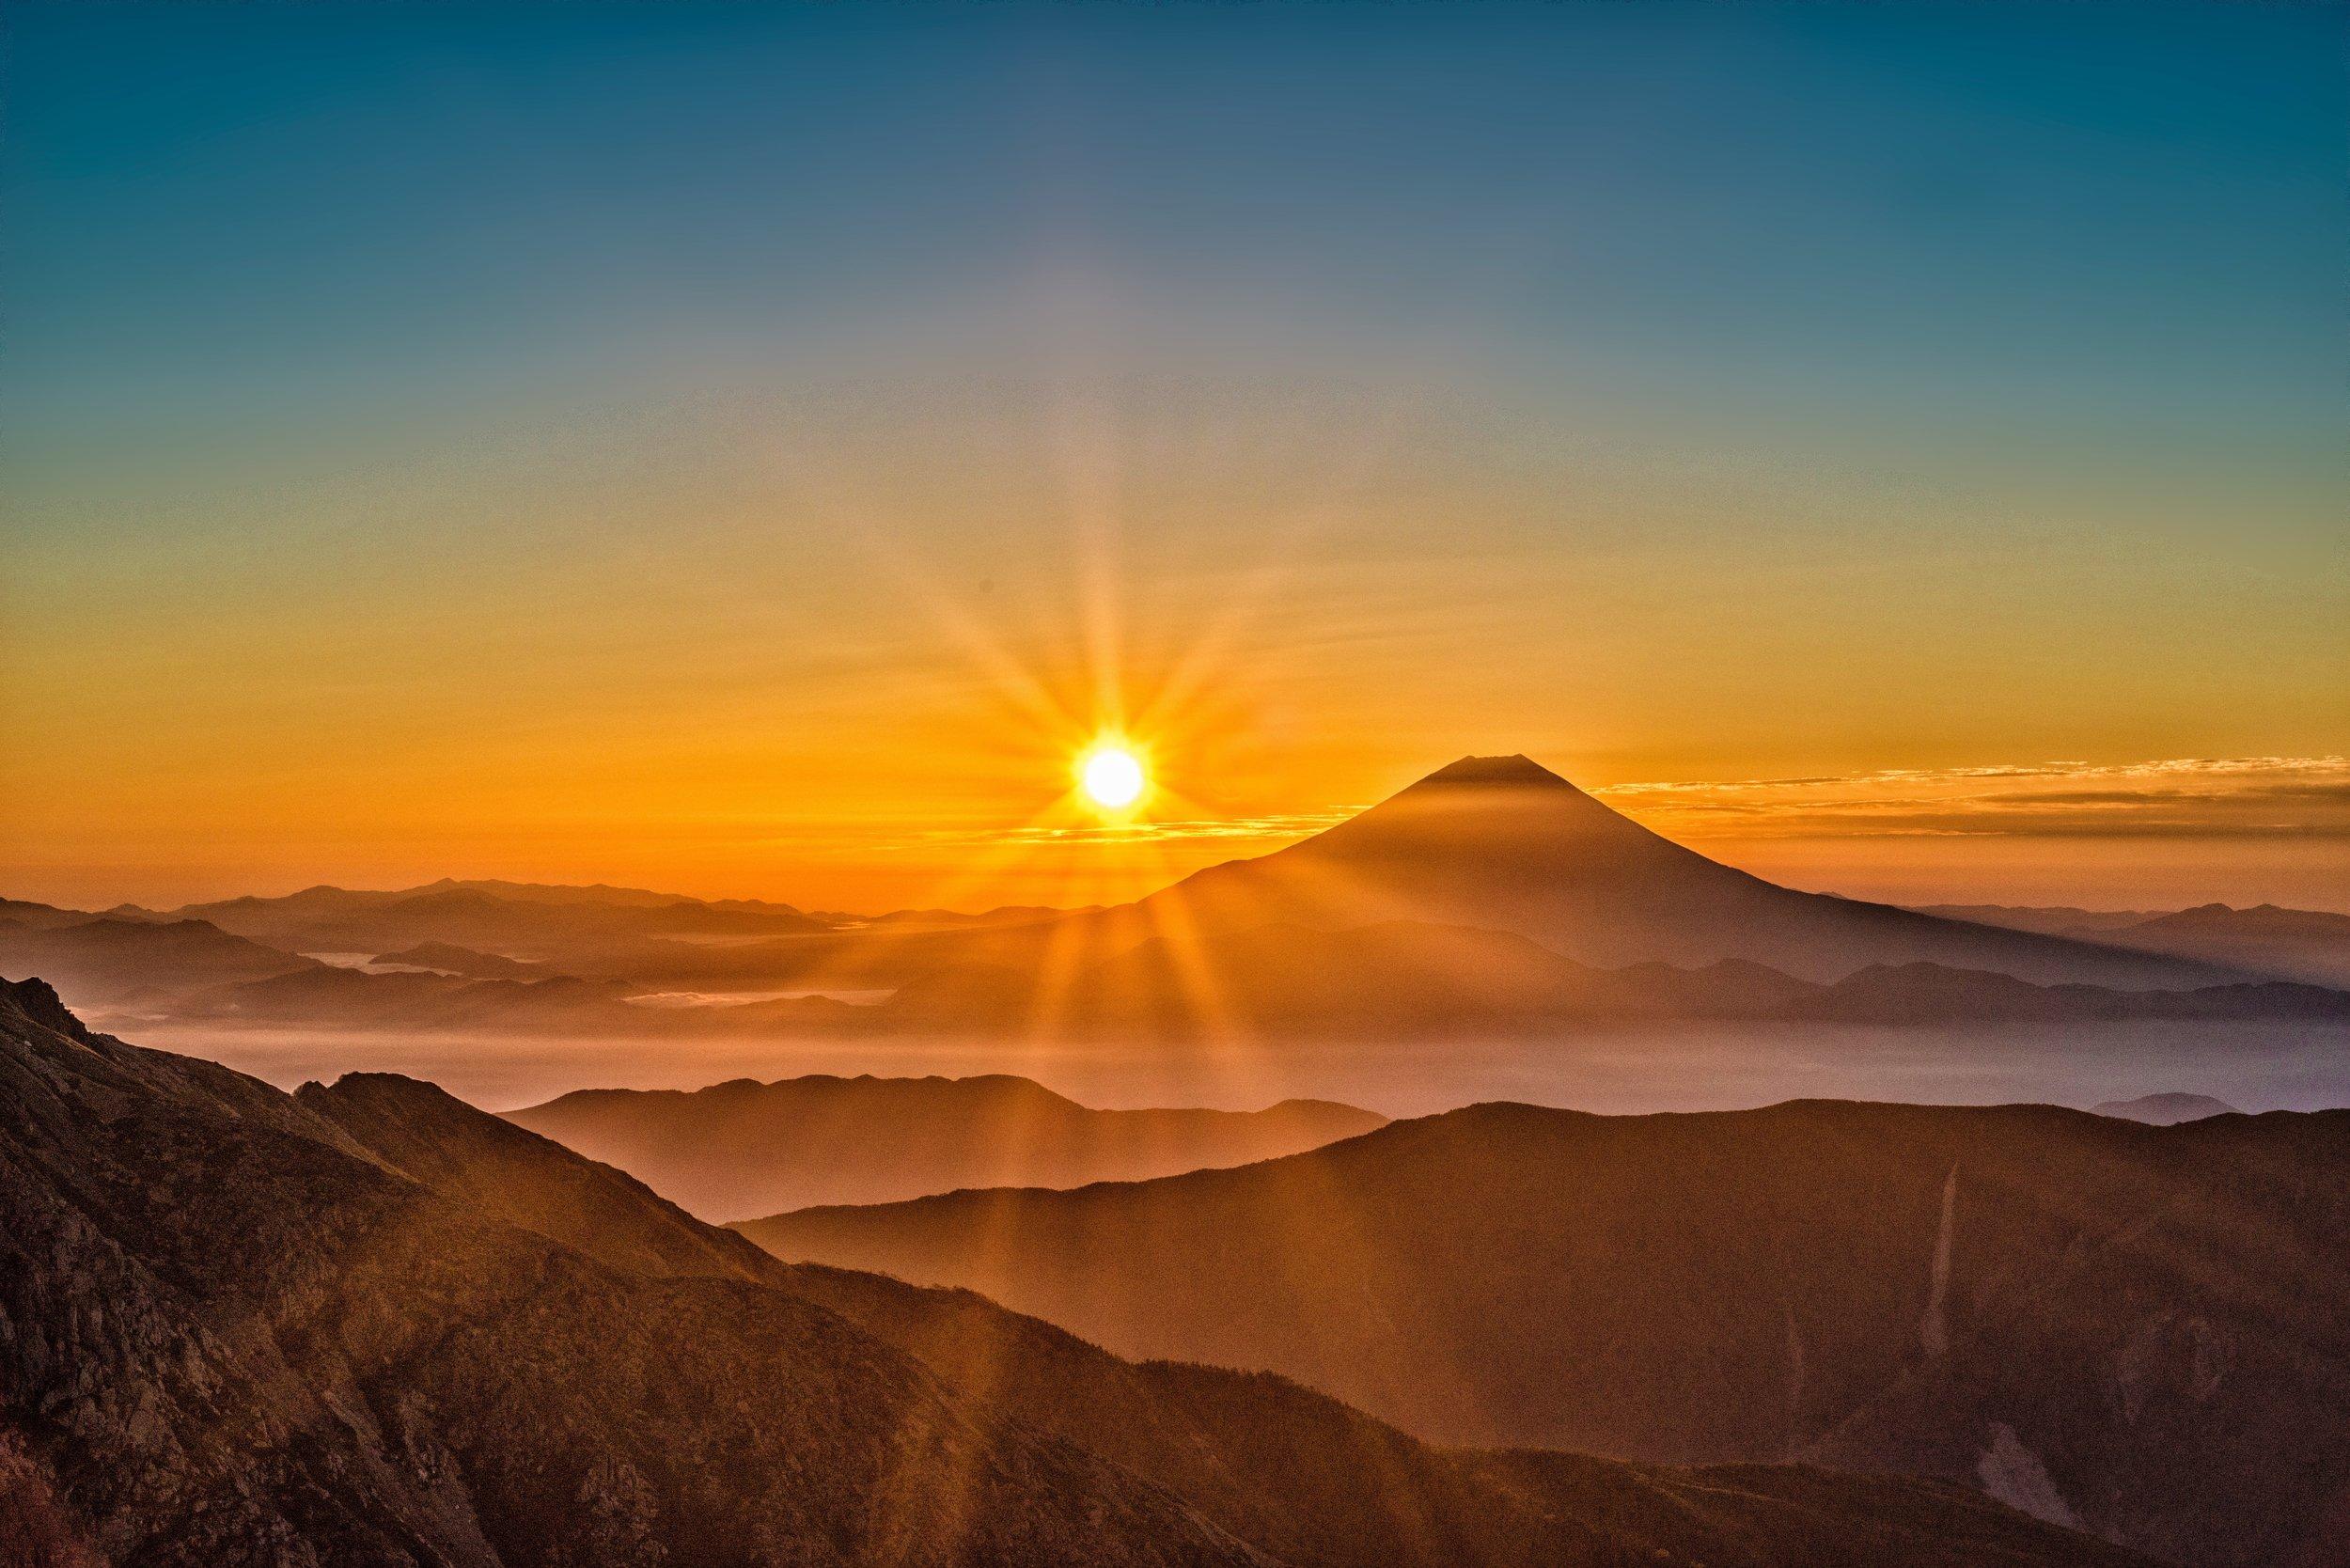 clouds-dawn-desert-407039.jpg